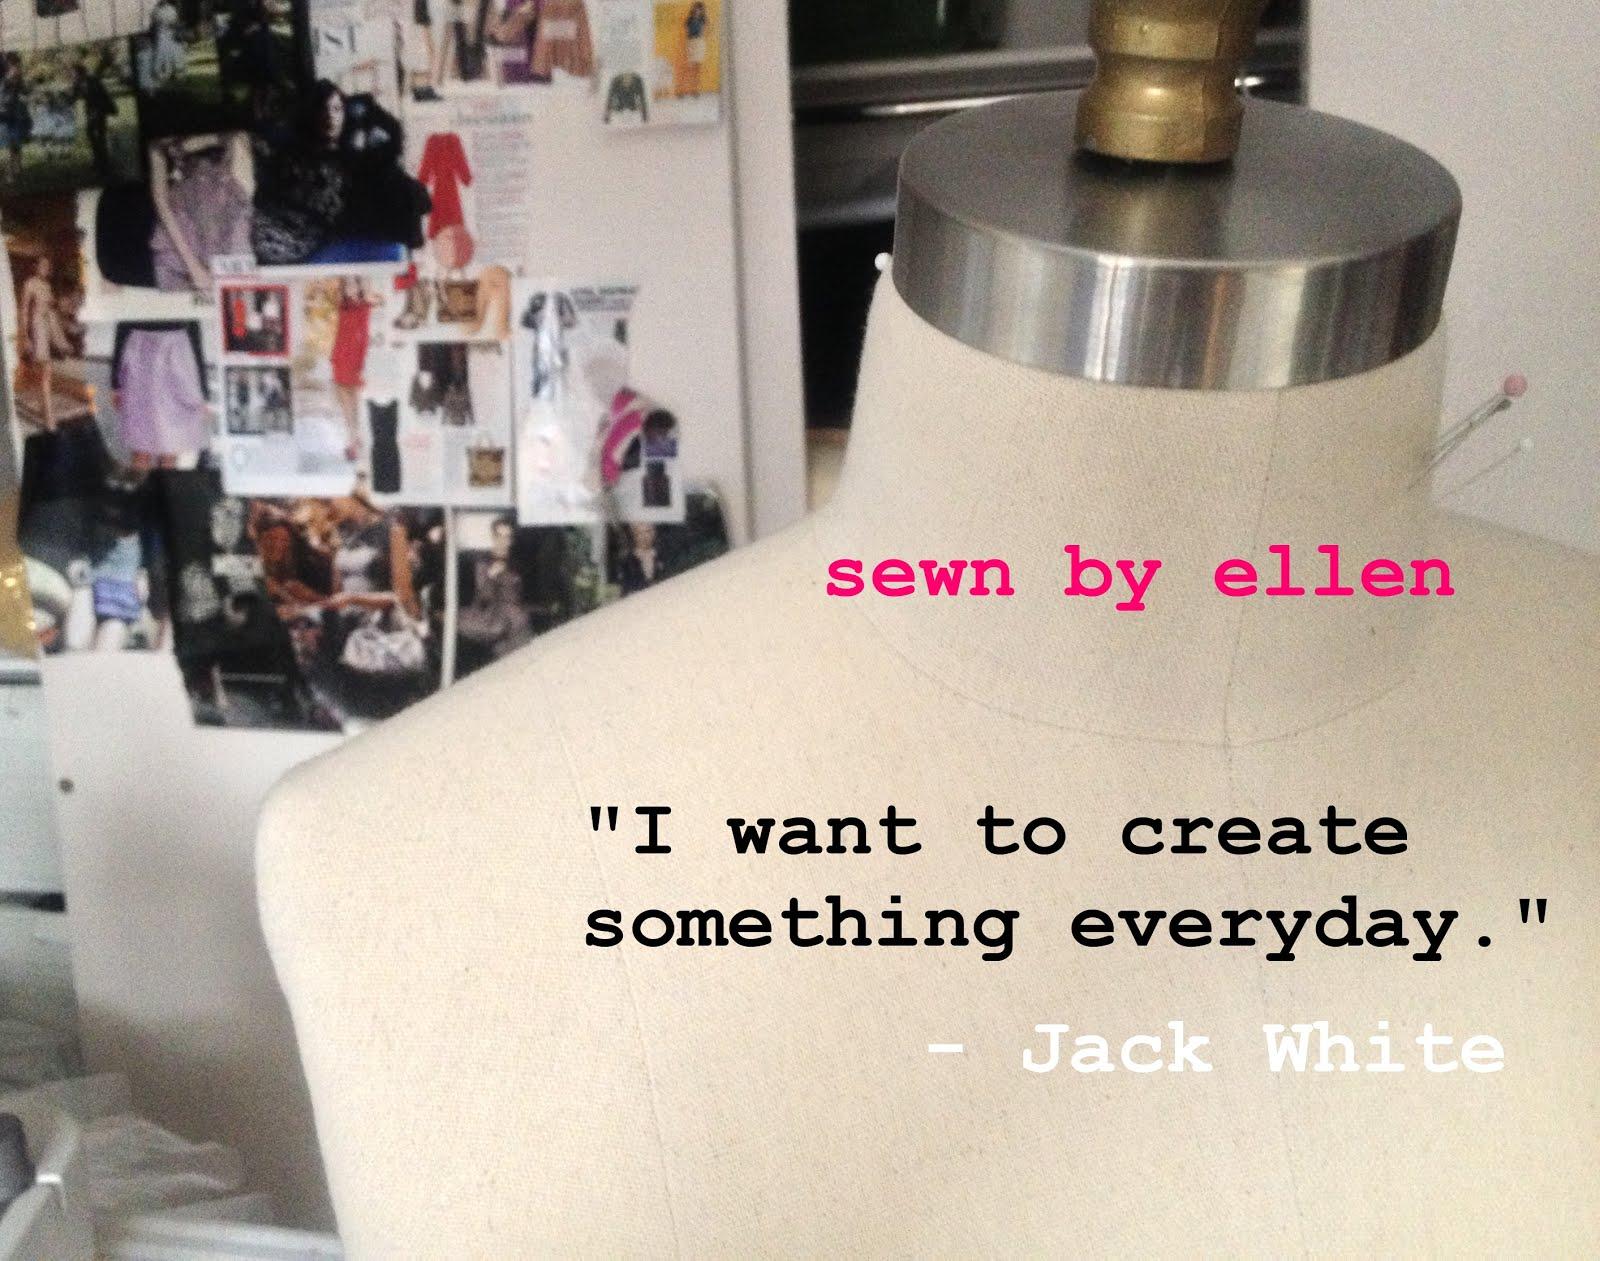 Sewn by Ellen